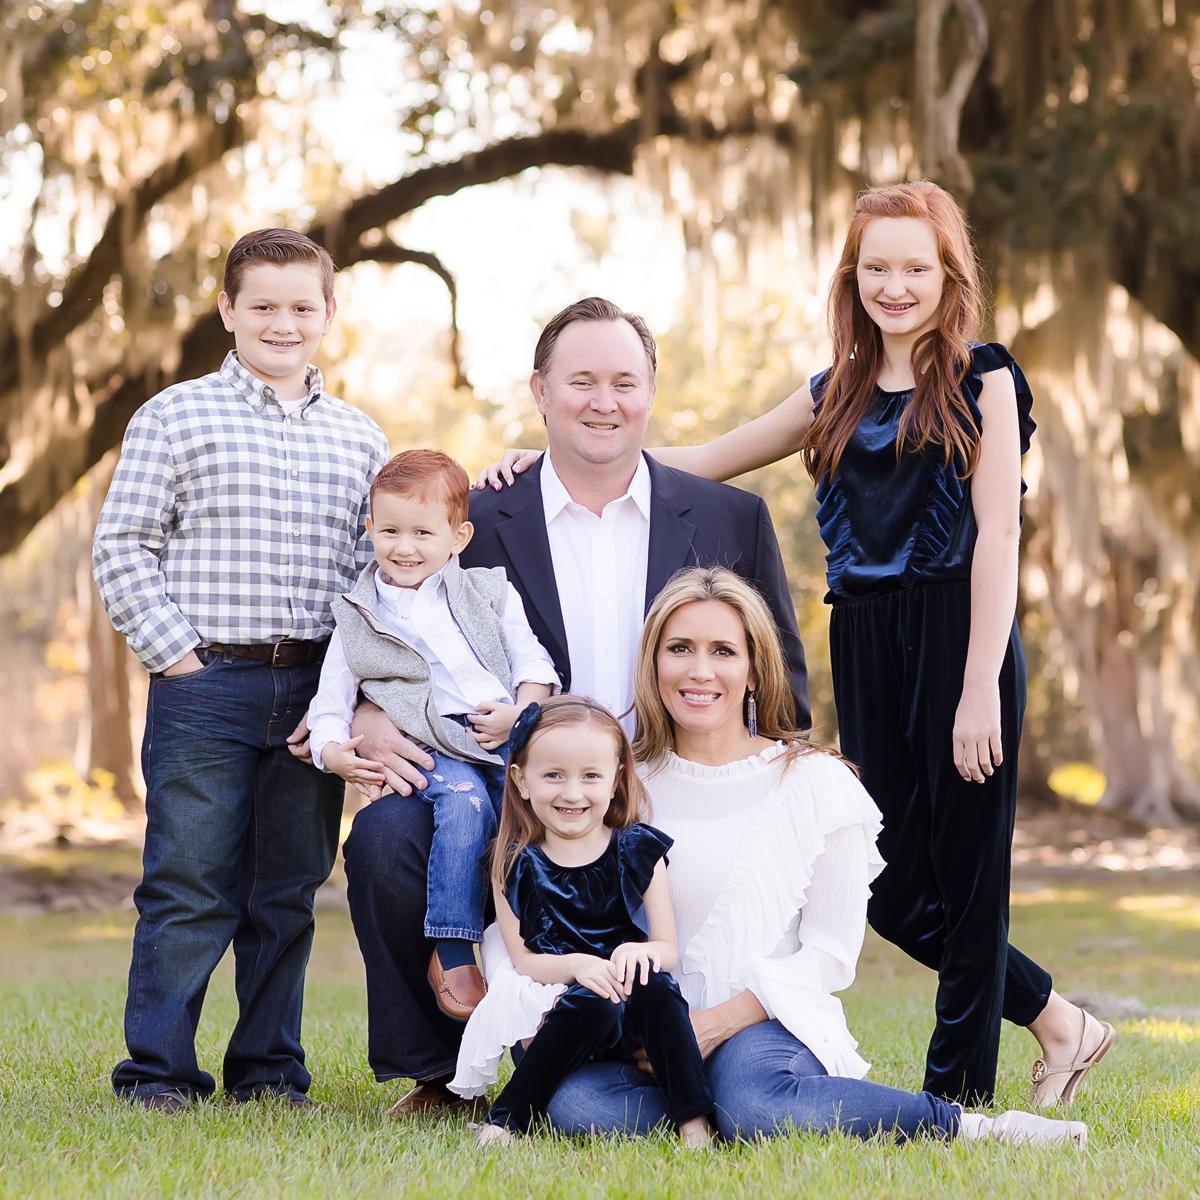 Brad-Drury-Family.jpg